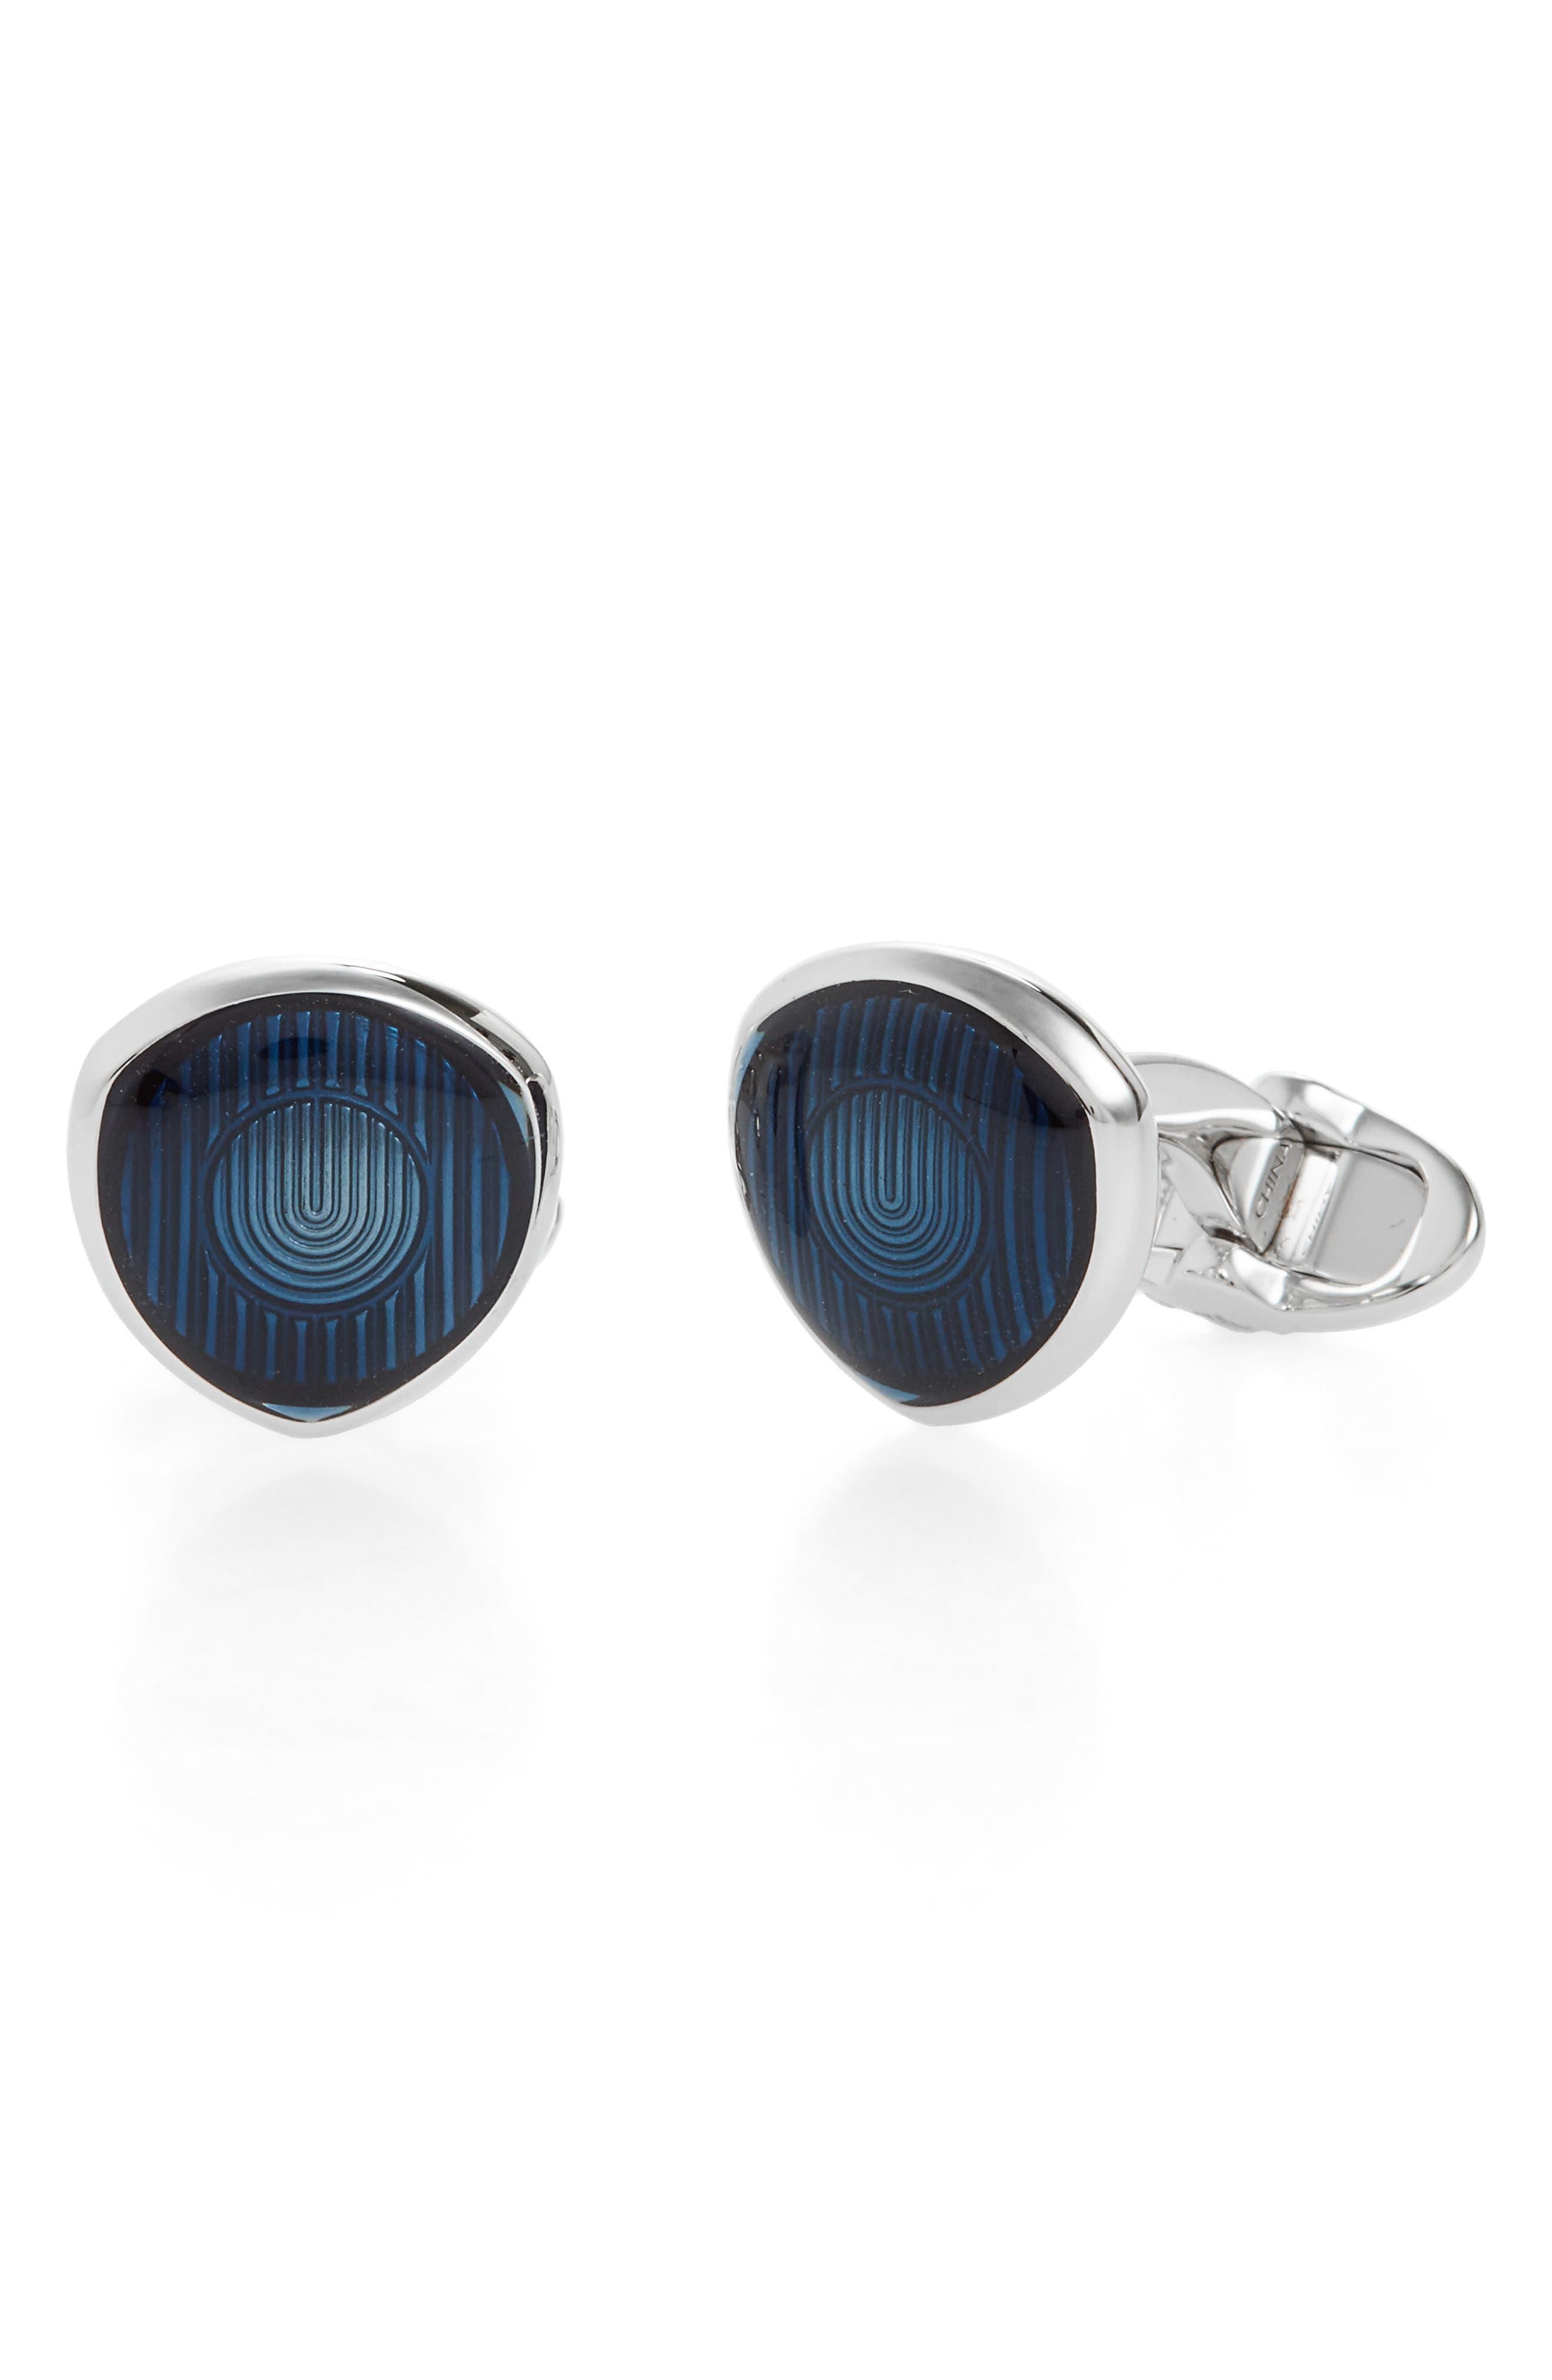 Headlamp Cuff Links,                             Main thumbnail 1, color,                             Blue/Silver